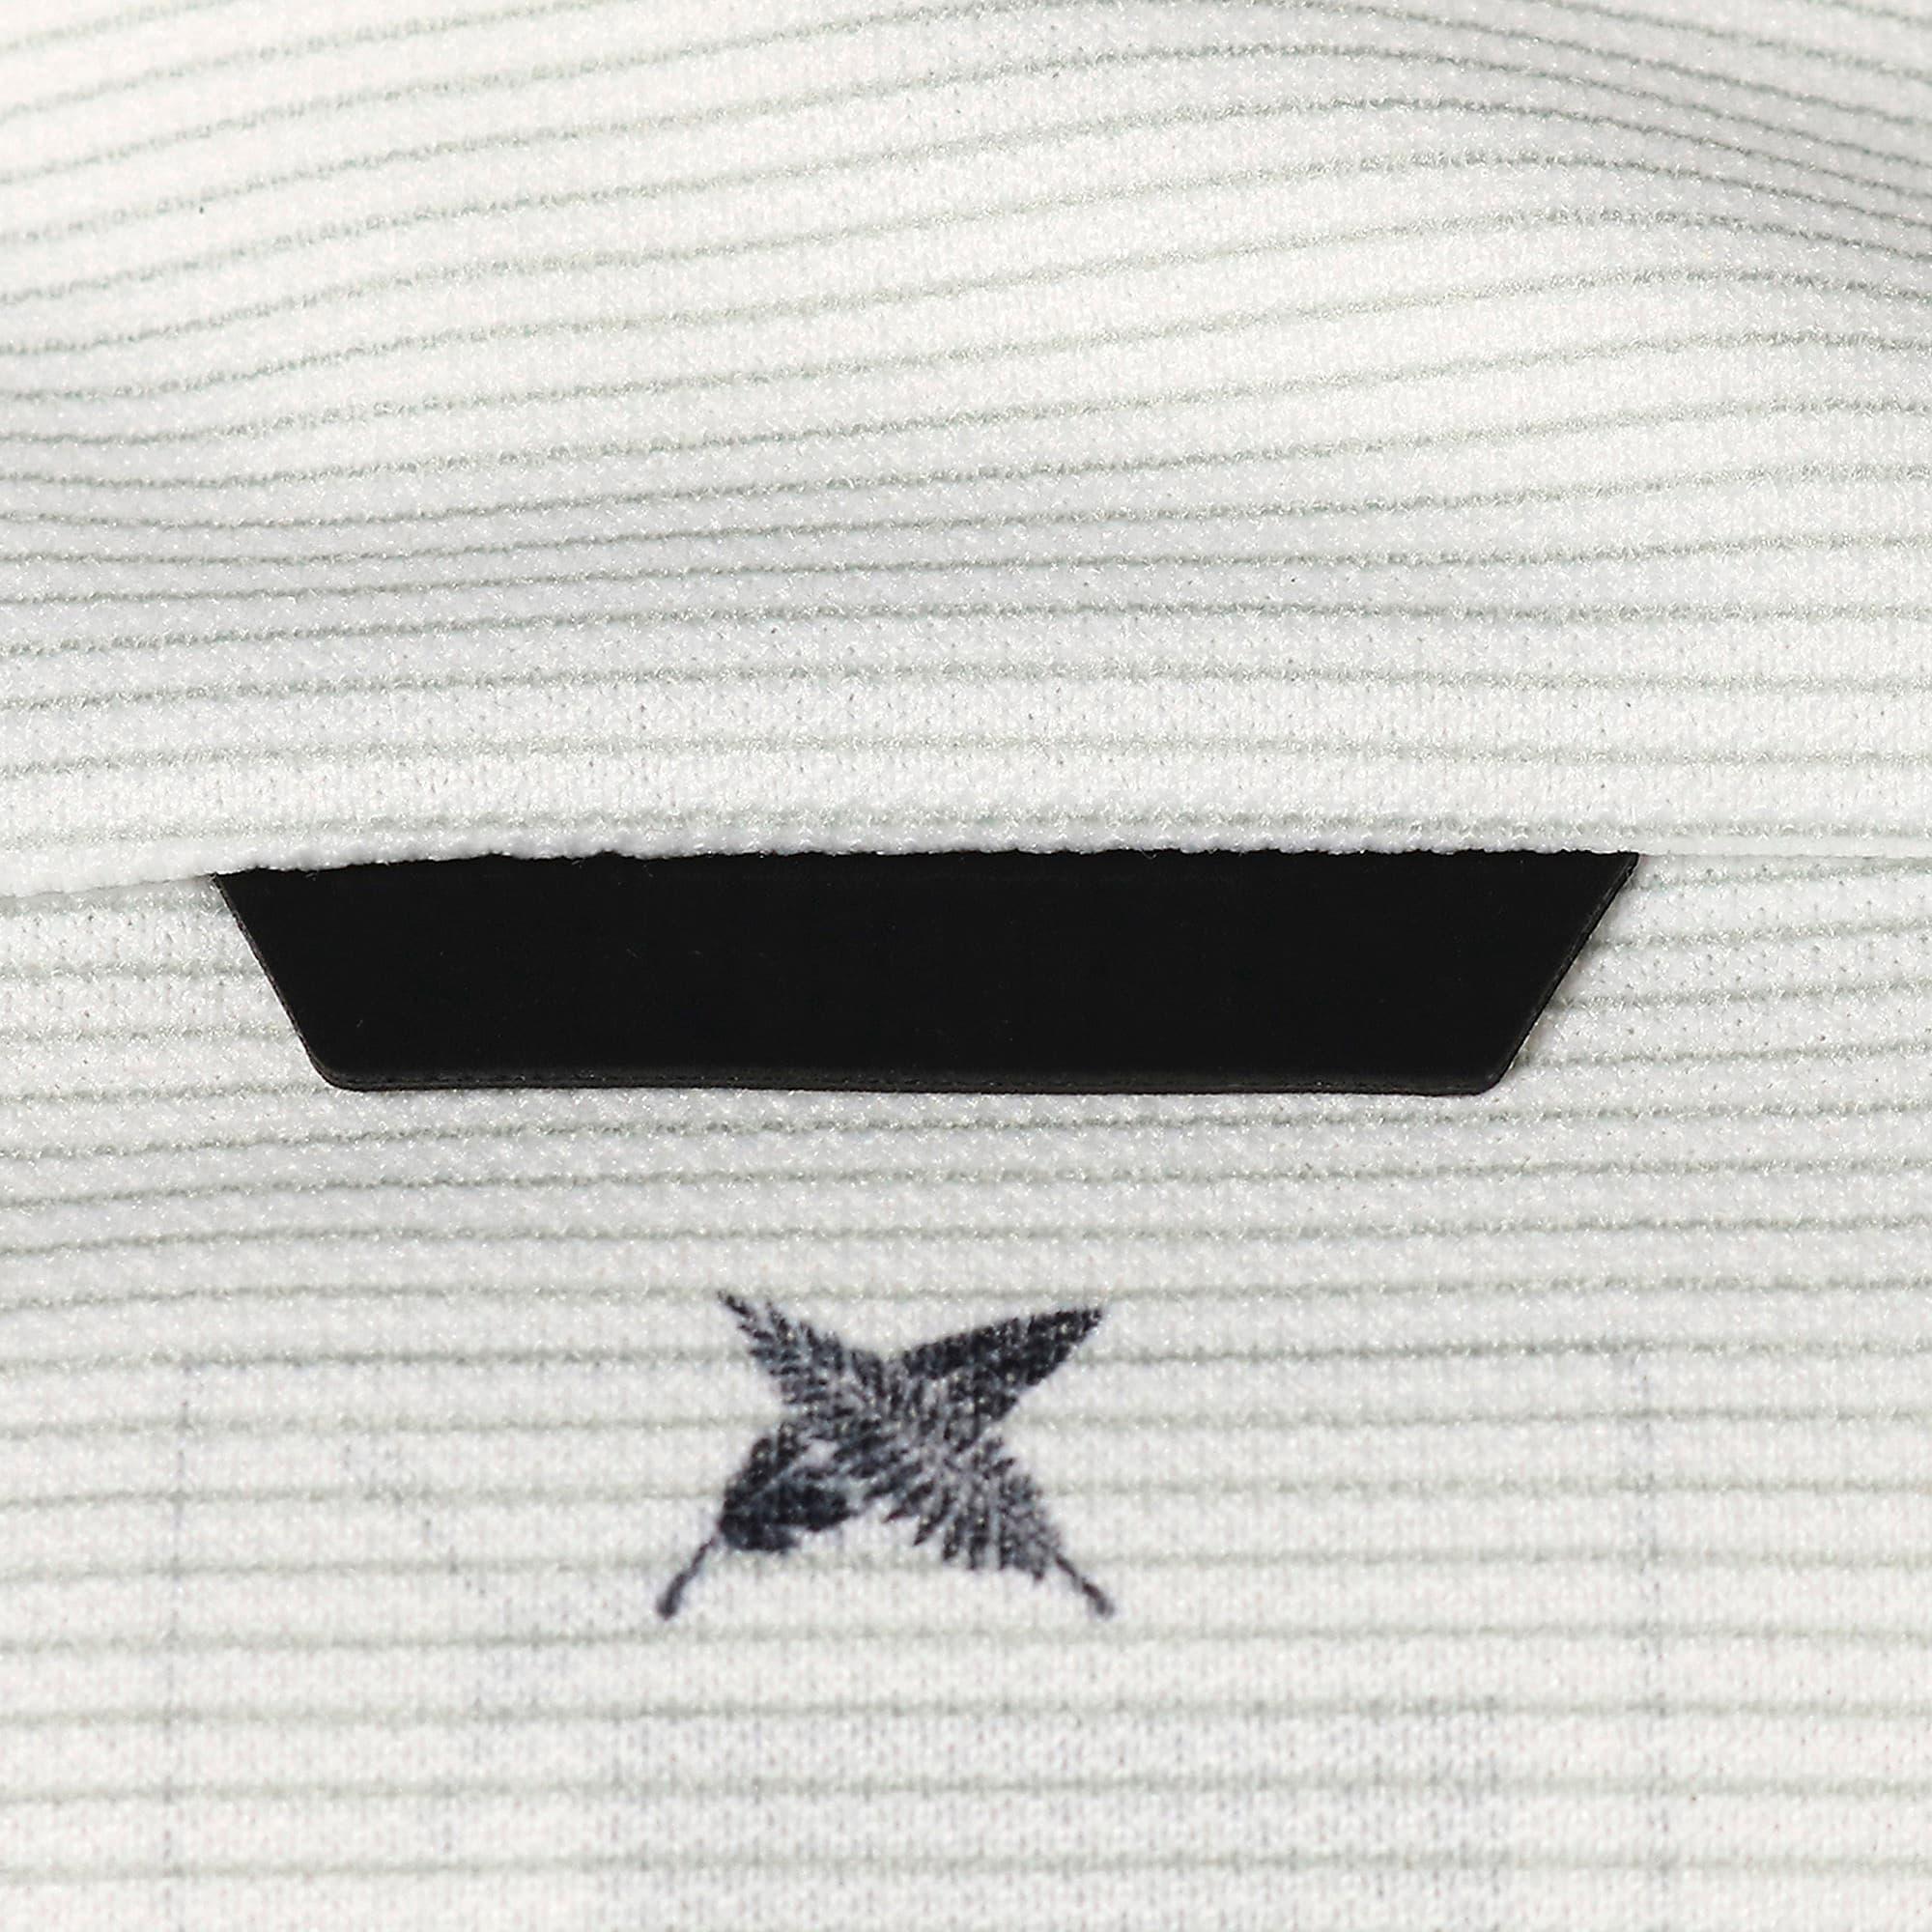 Thumbnail 8 of ゴルフ フェザーフュージョン SSポロシャツ 半袖, Bright White, medium-JPN